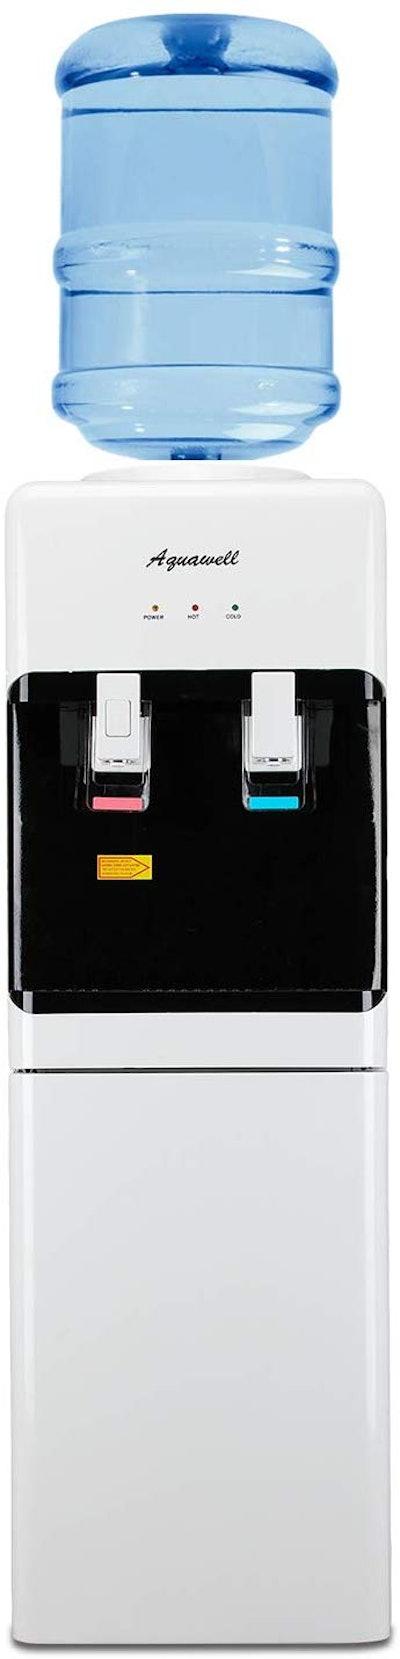 AQUAWELL Water Dispenser Hot & Cold Water Dispenser